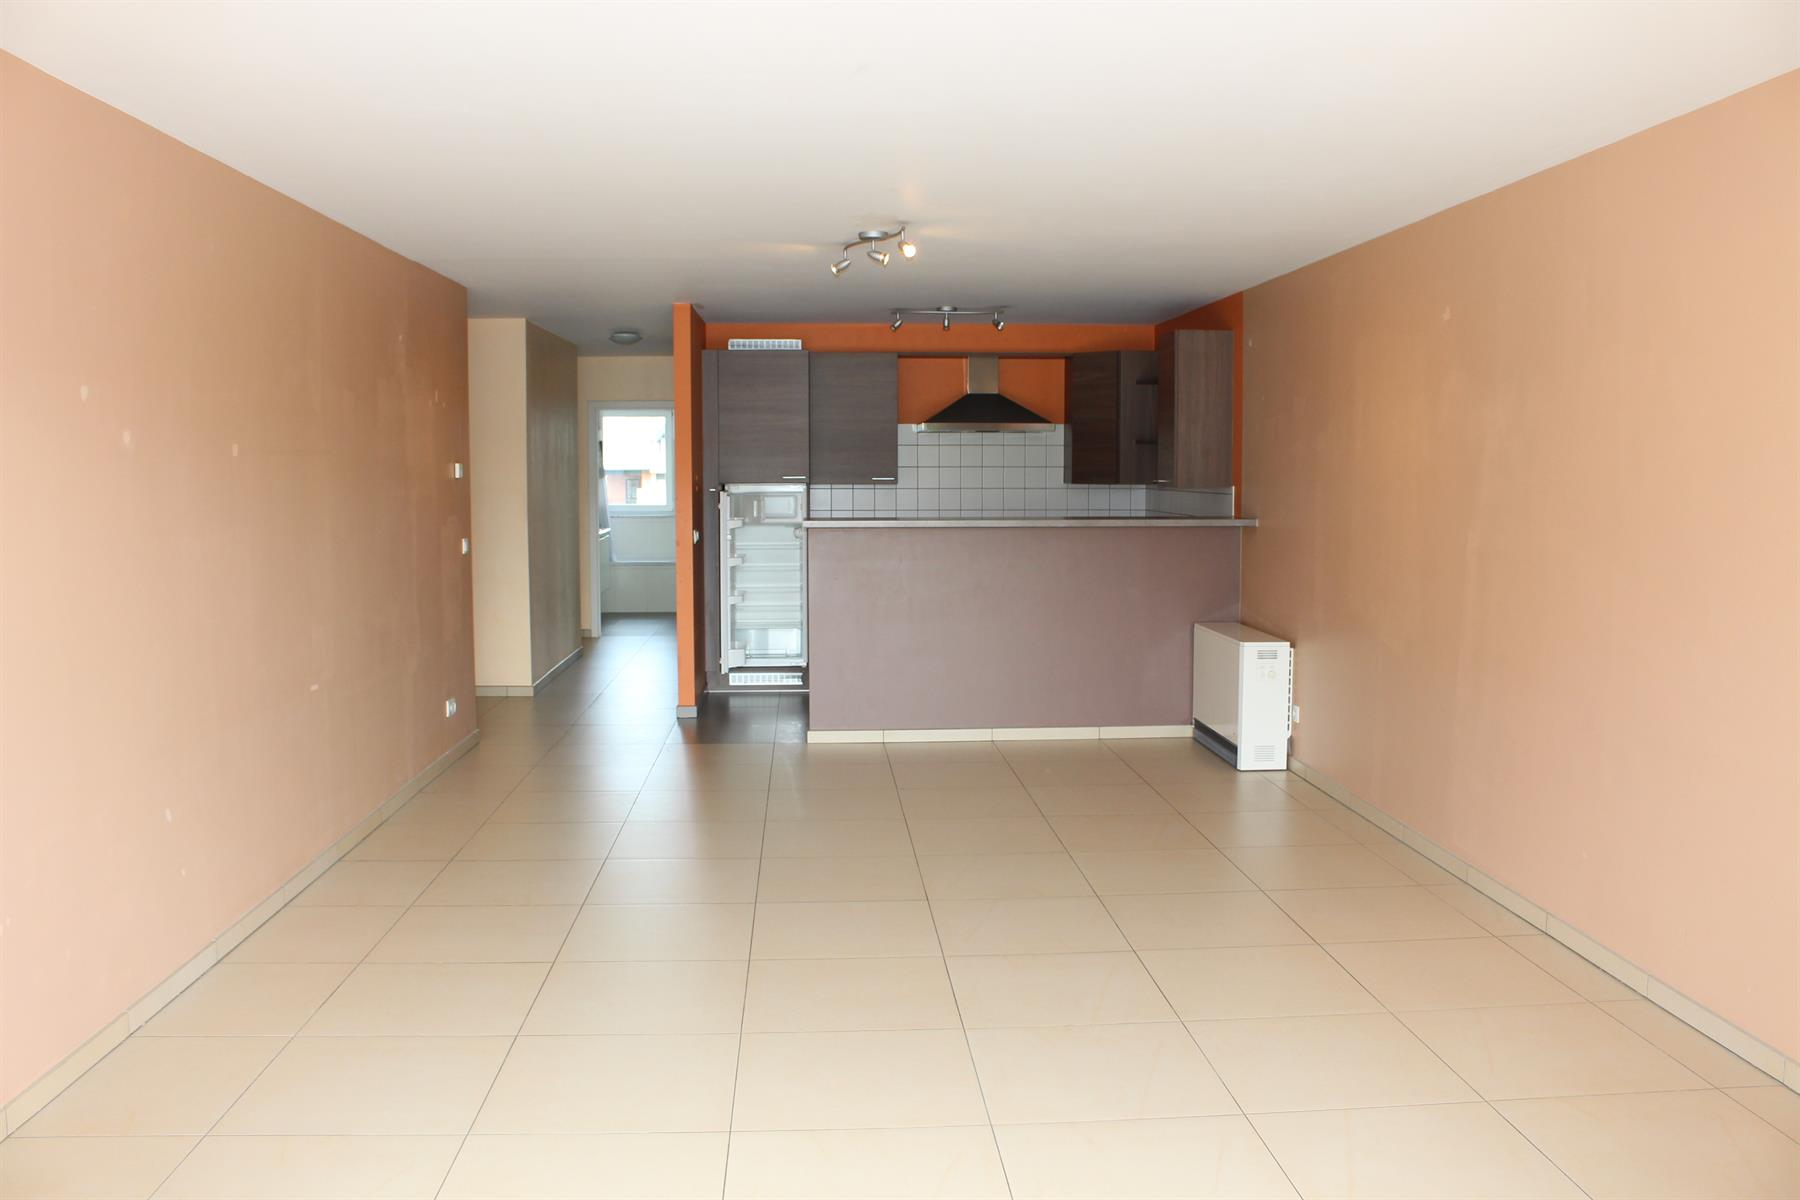 Appartement - Nivelles - #4099995-1